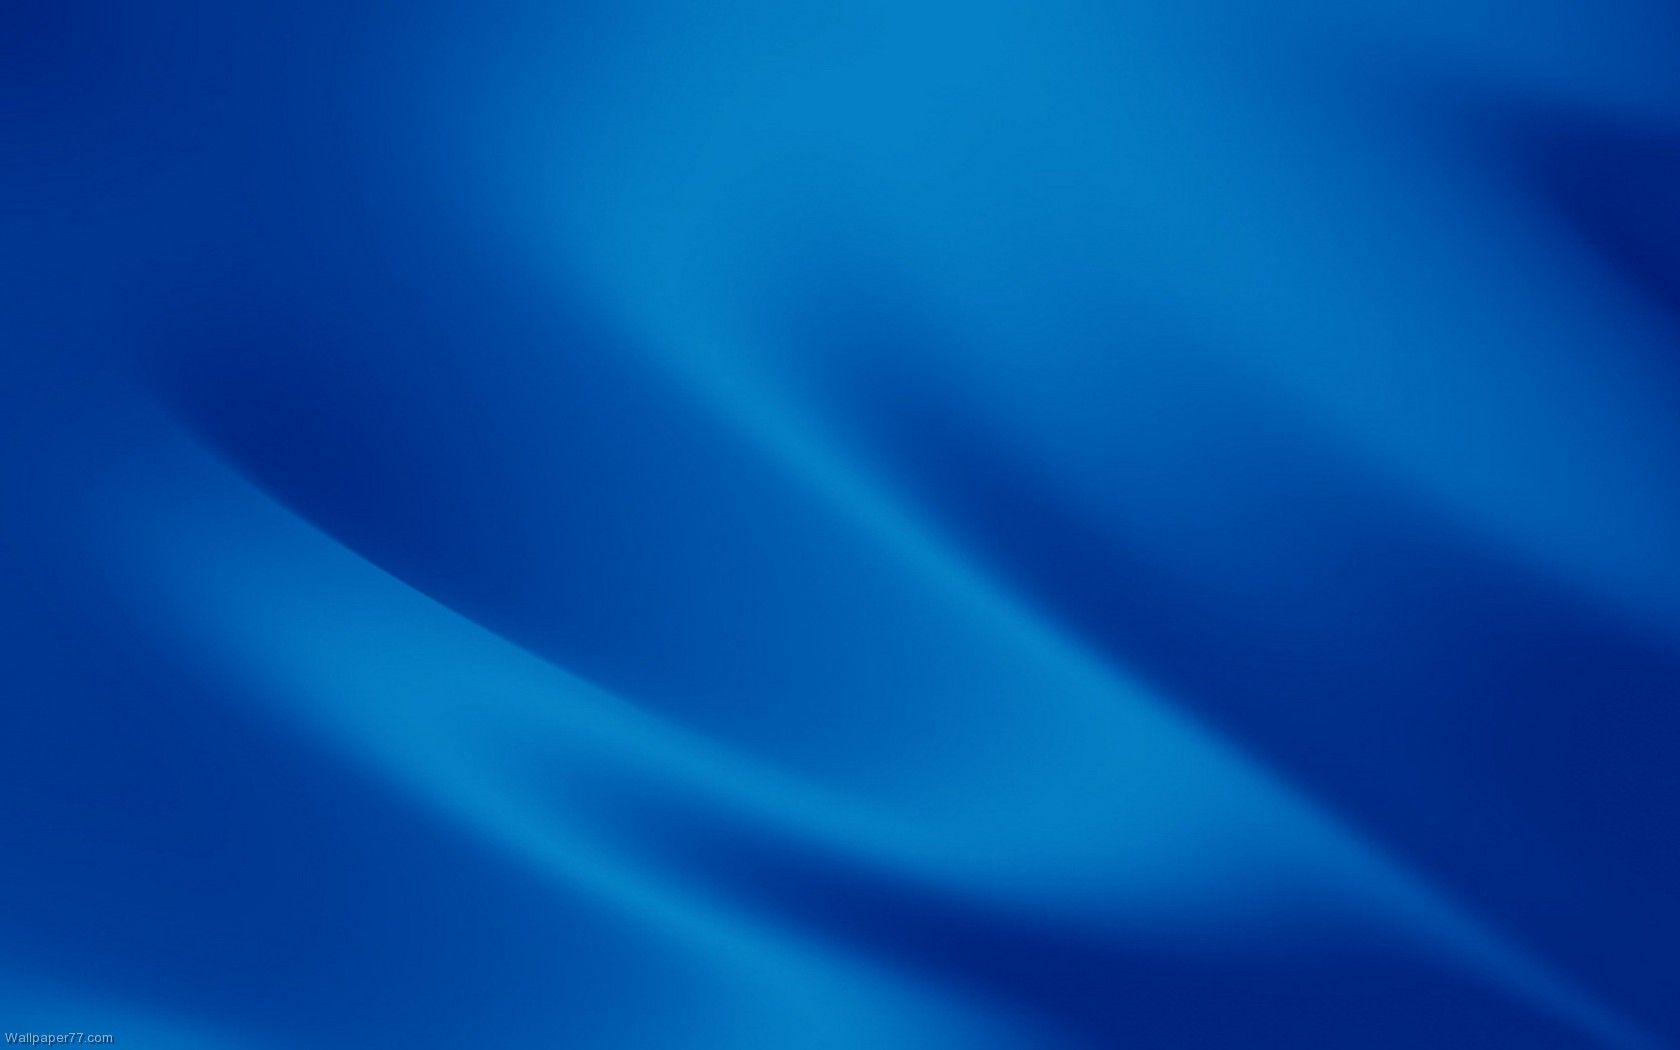 Pattern Blue Navy Blue Wallpaper Royal Blue Wallpaper Great Choice